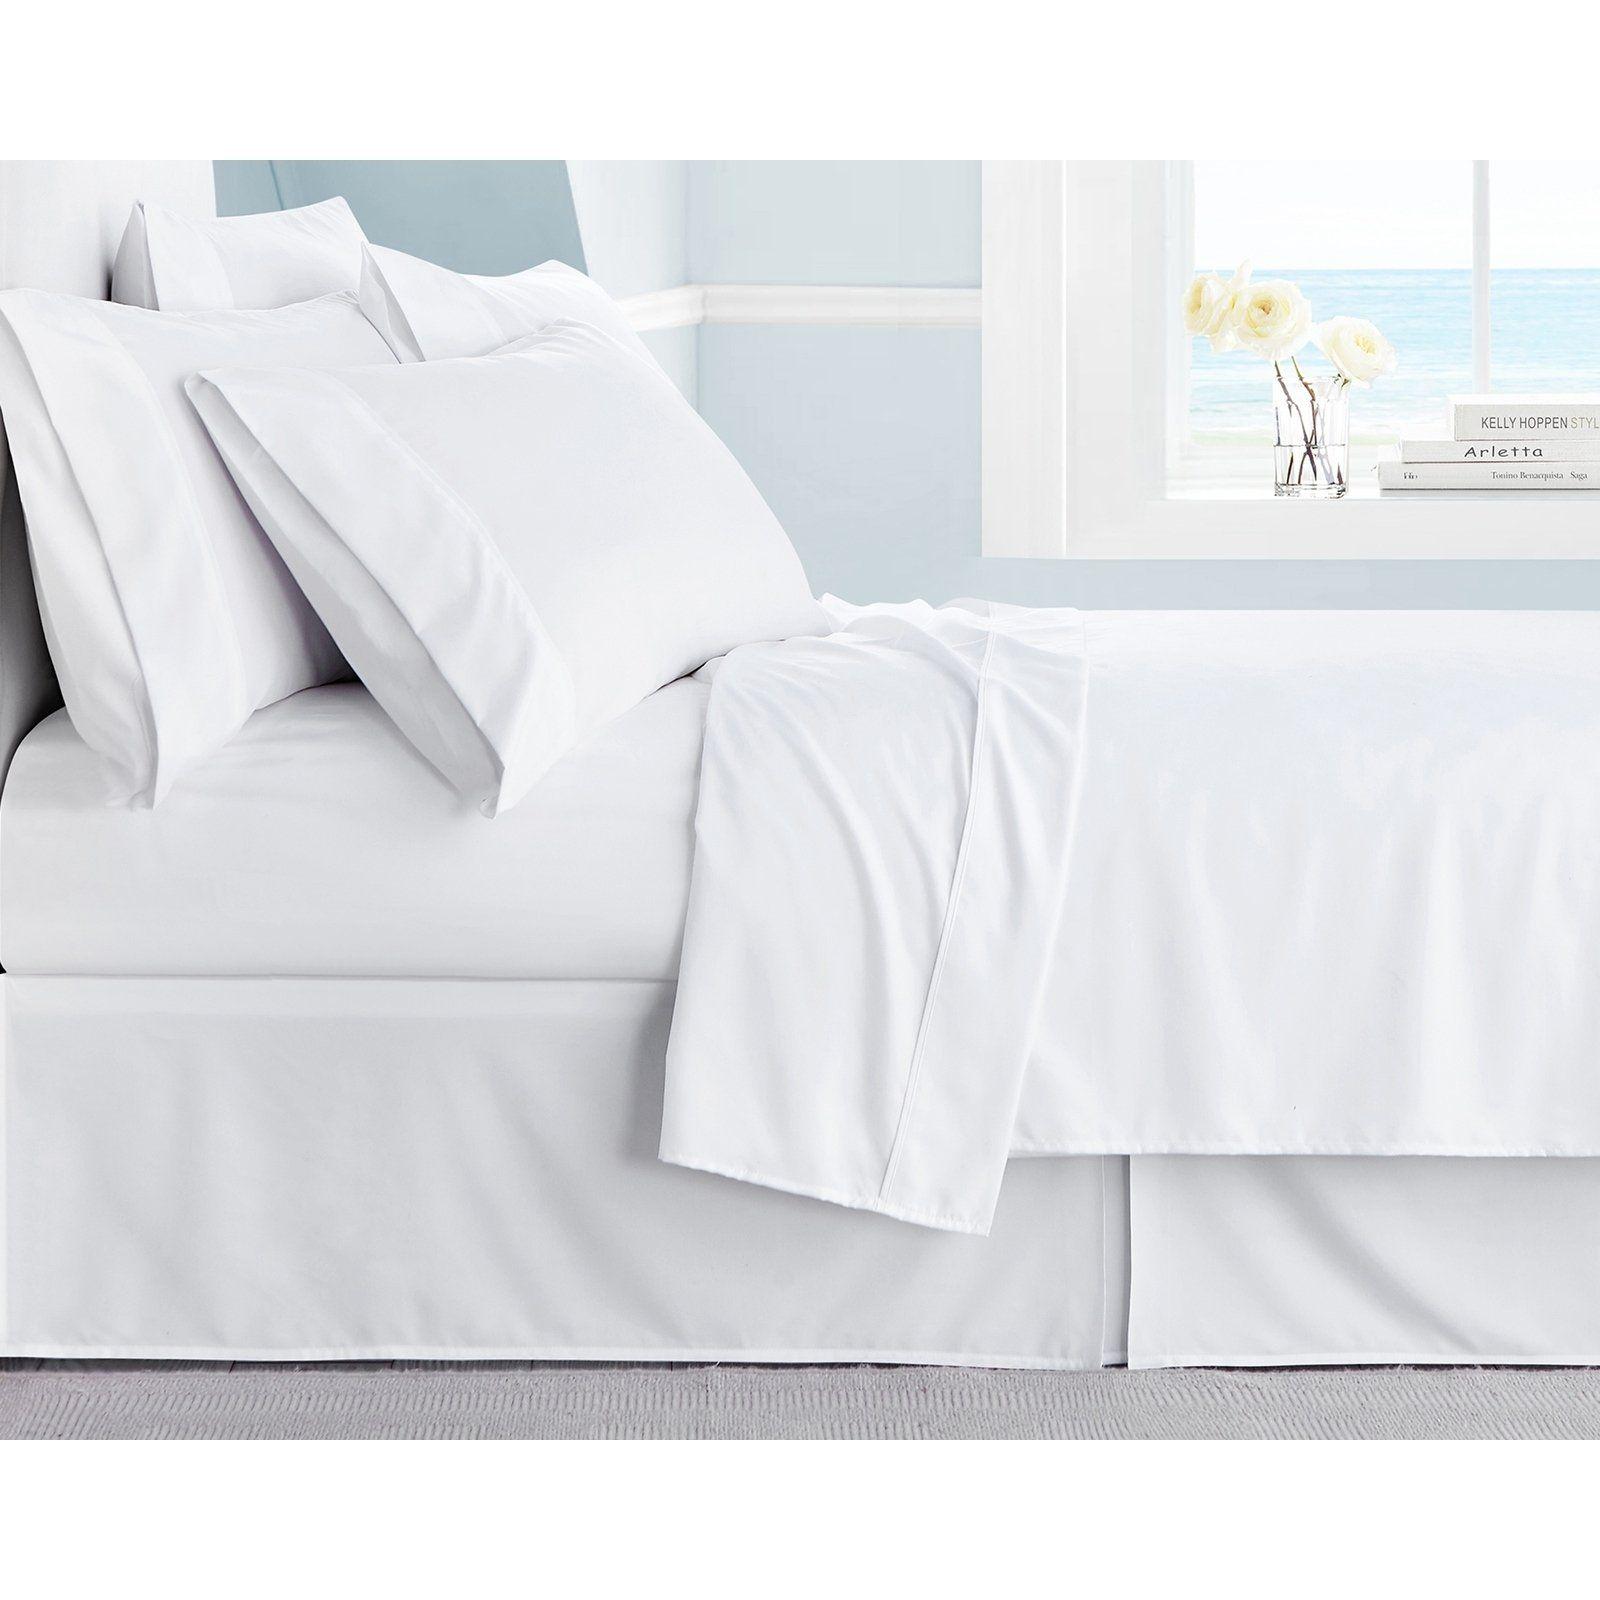 Our Best Bed Sheets Pillowcases Deals Bed Sheet Sets Bed Sheets Flat Sheets California king deep pocket sheets